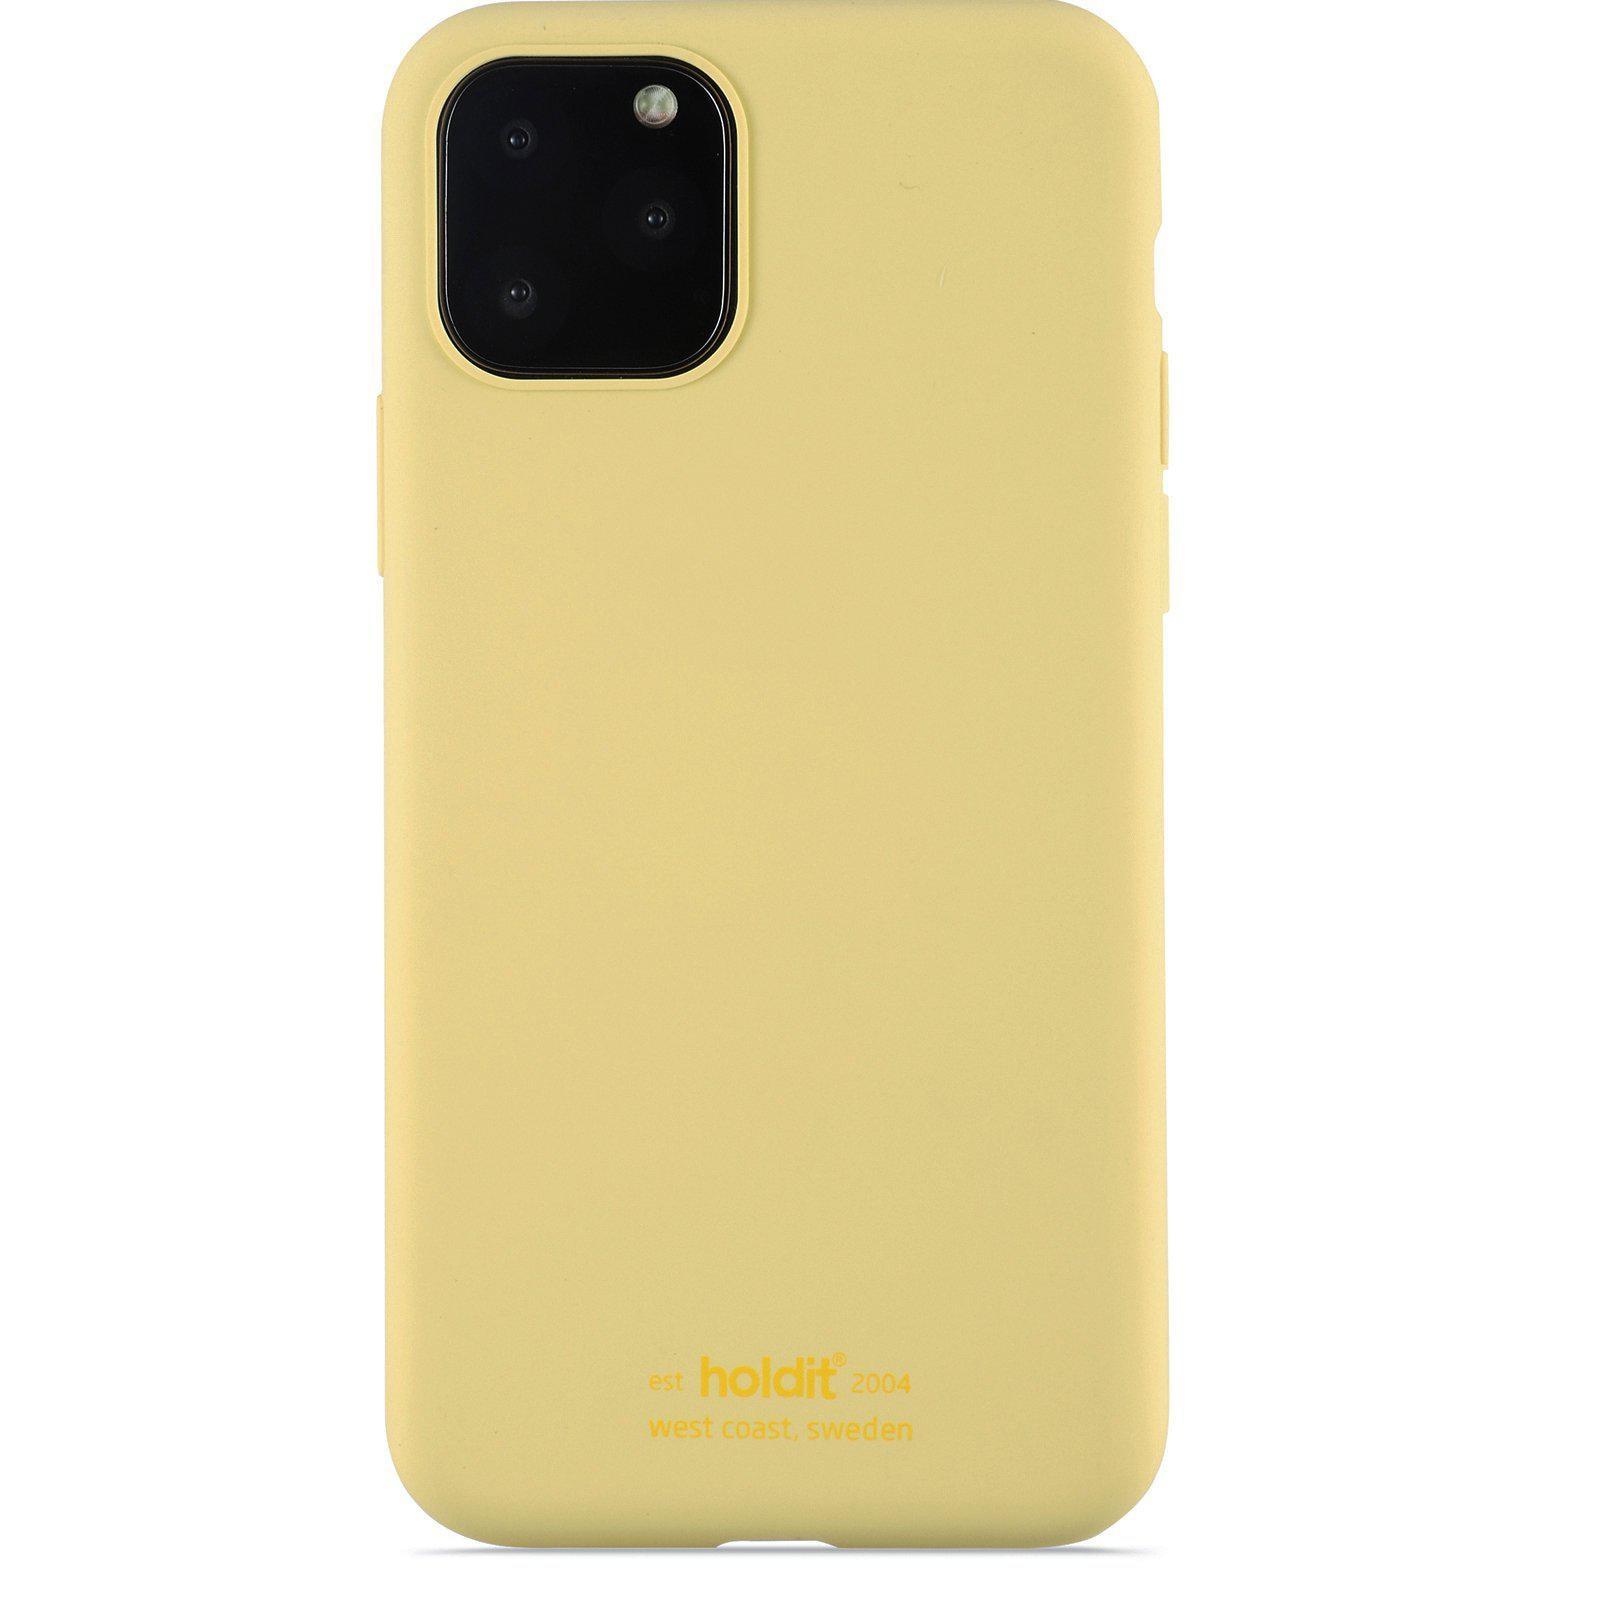 Silikonskal iPhone 11 Pro/XS/X Yellow